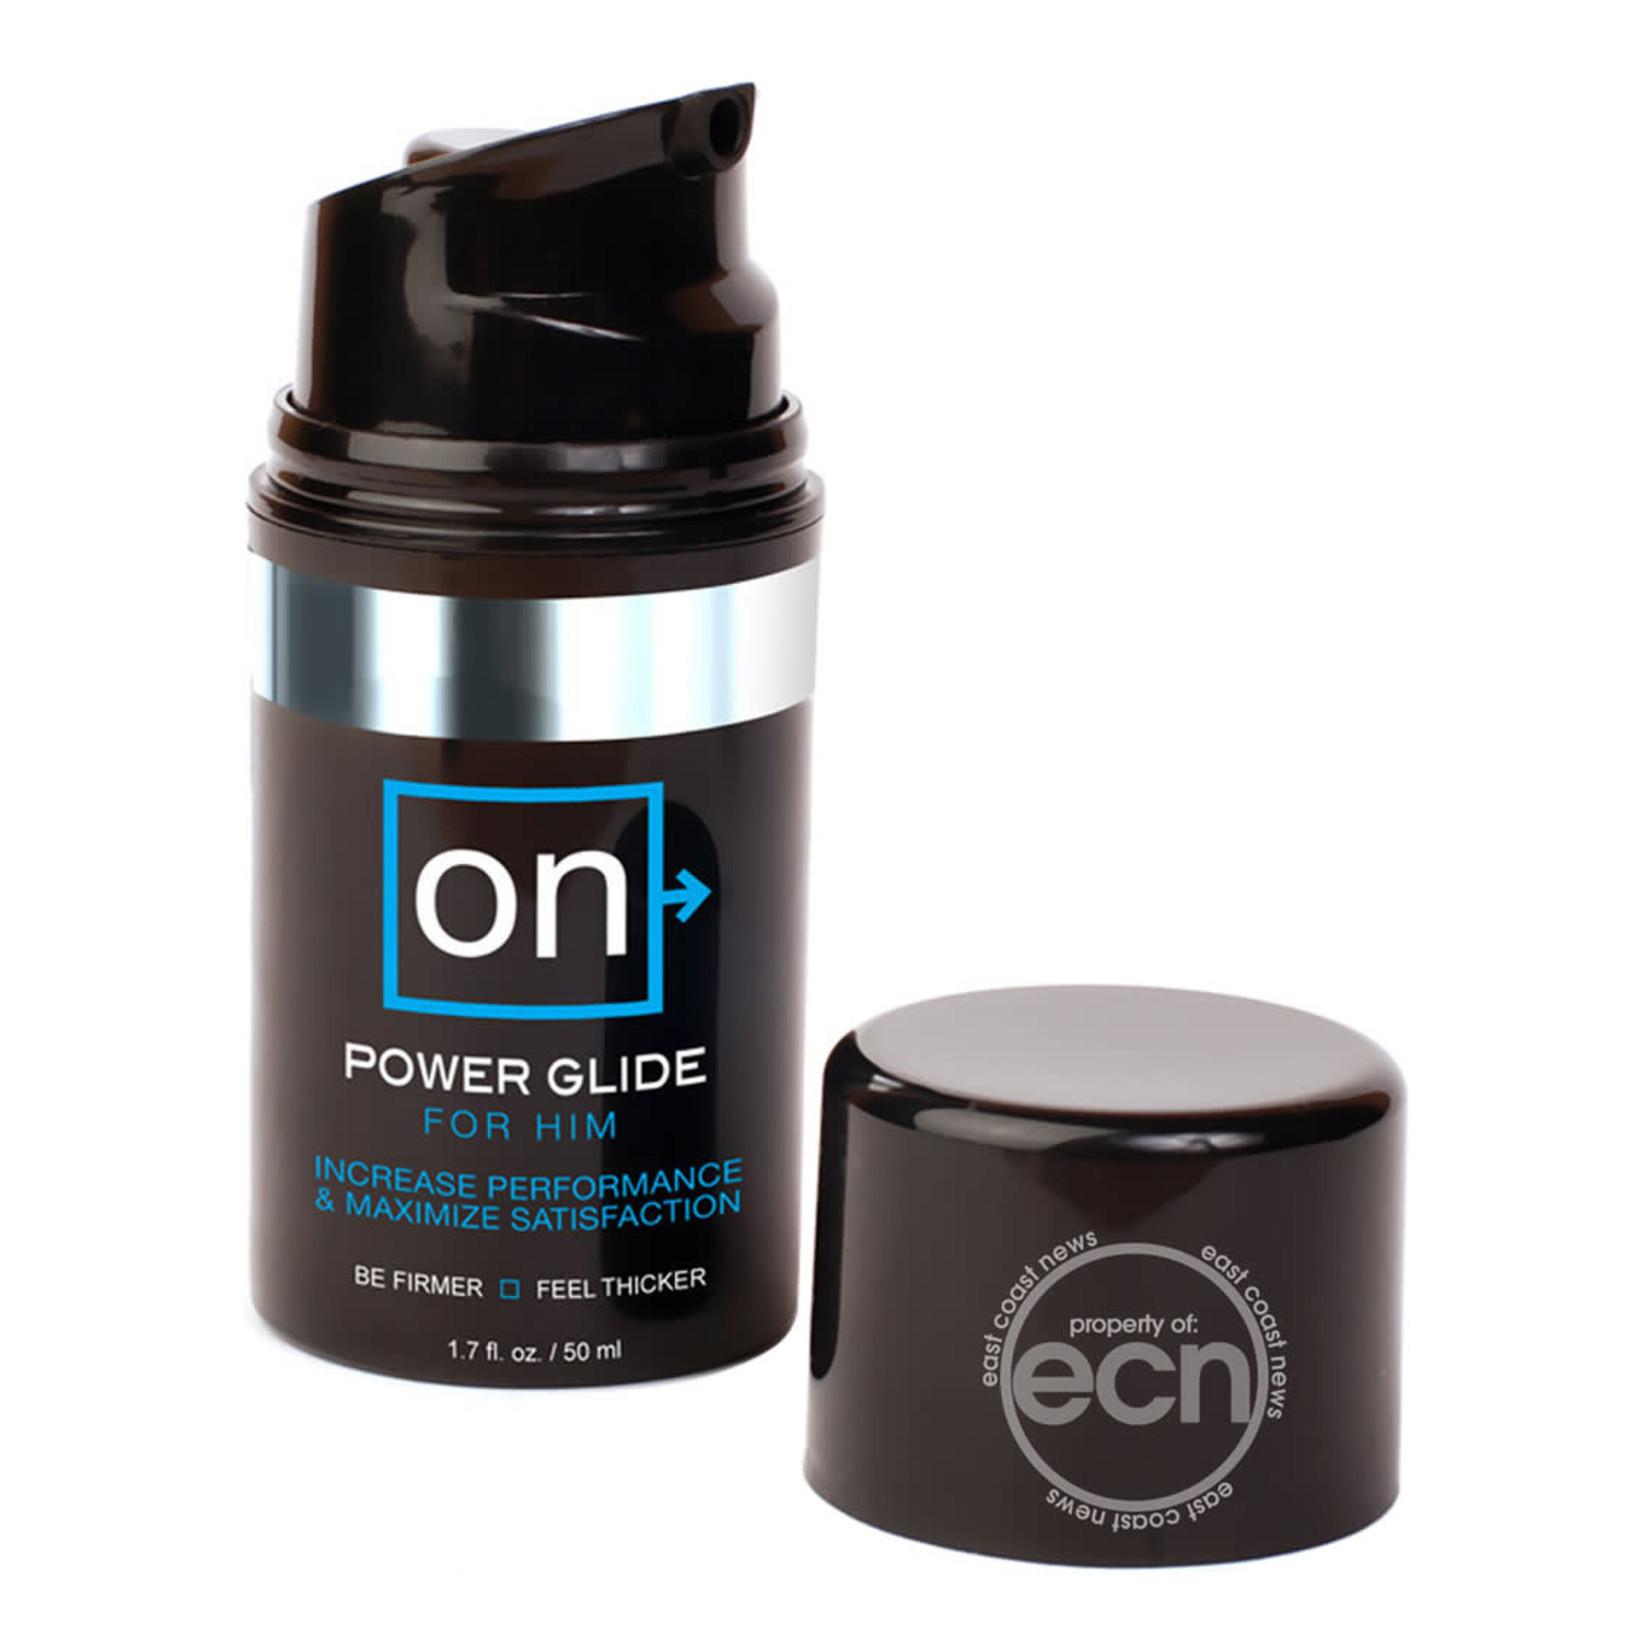 On™ Power Glide for Him 1.7 fl.oz. Bottle